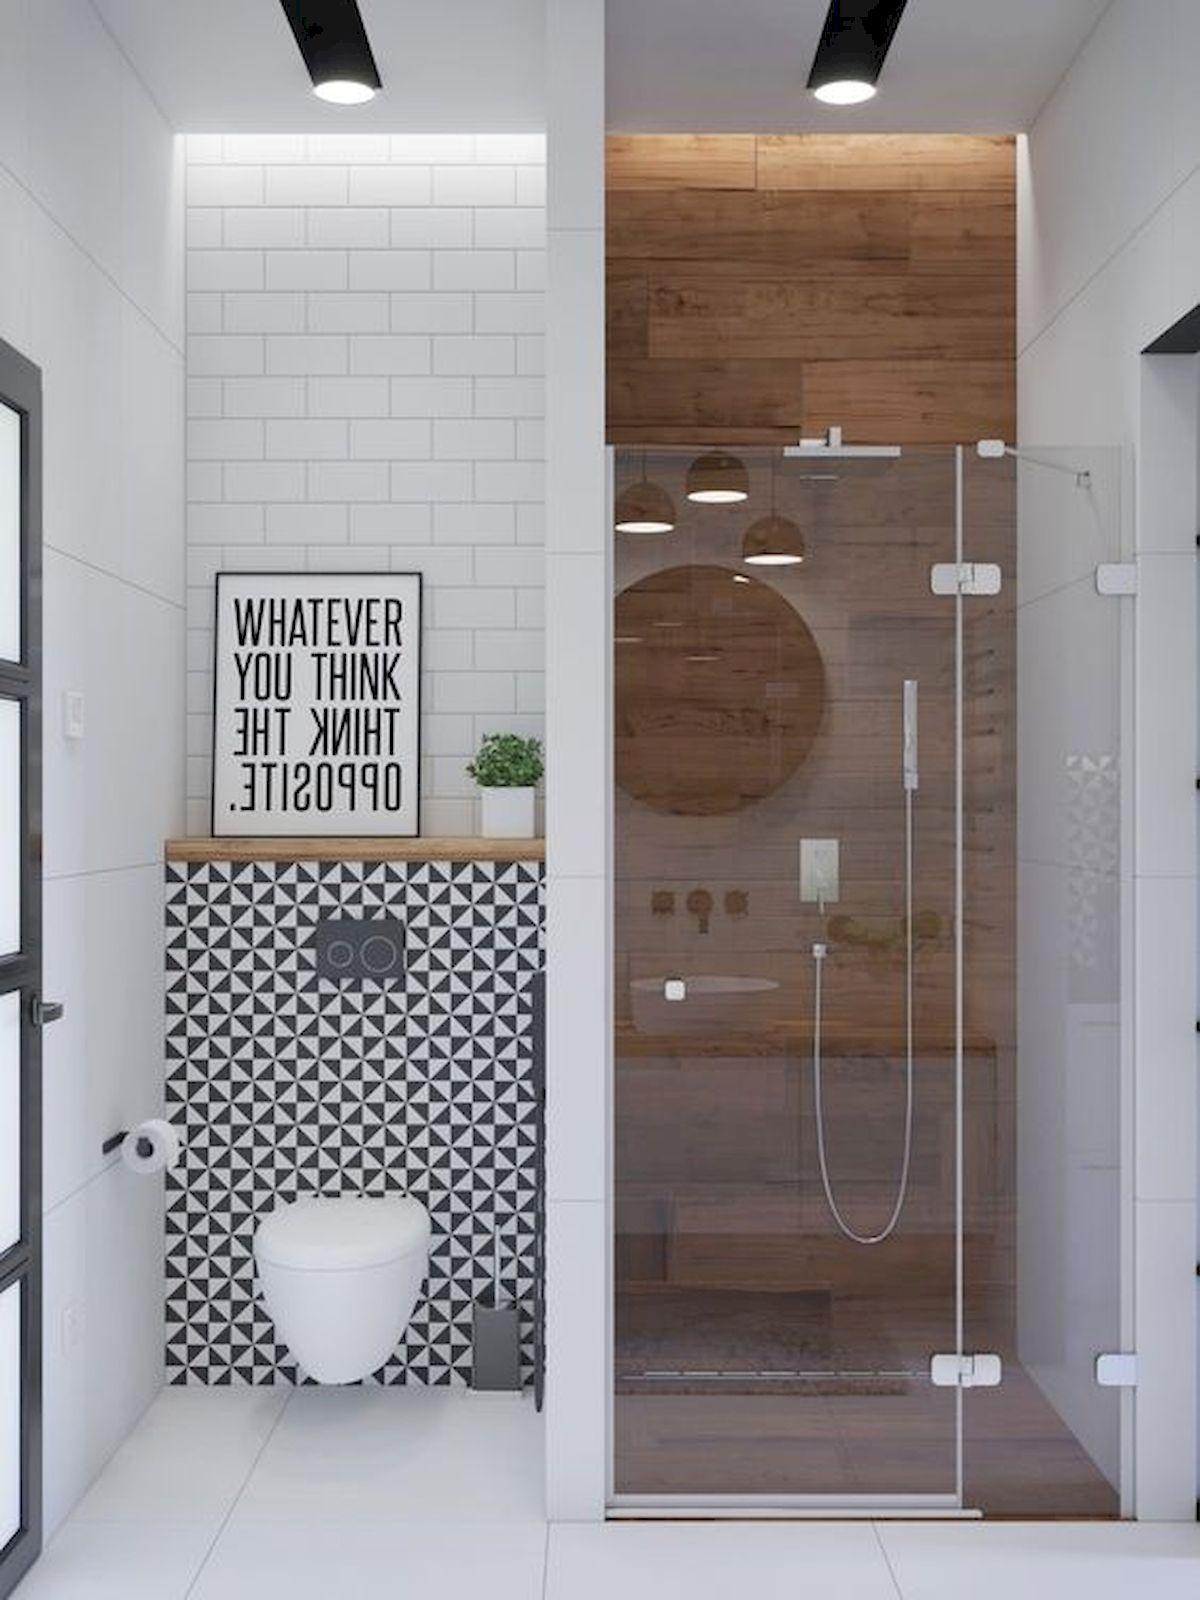 50 Stunning Small Bathroom Makeover Ideas – https://pickndecor.com/interior